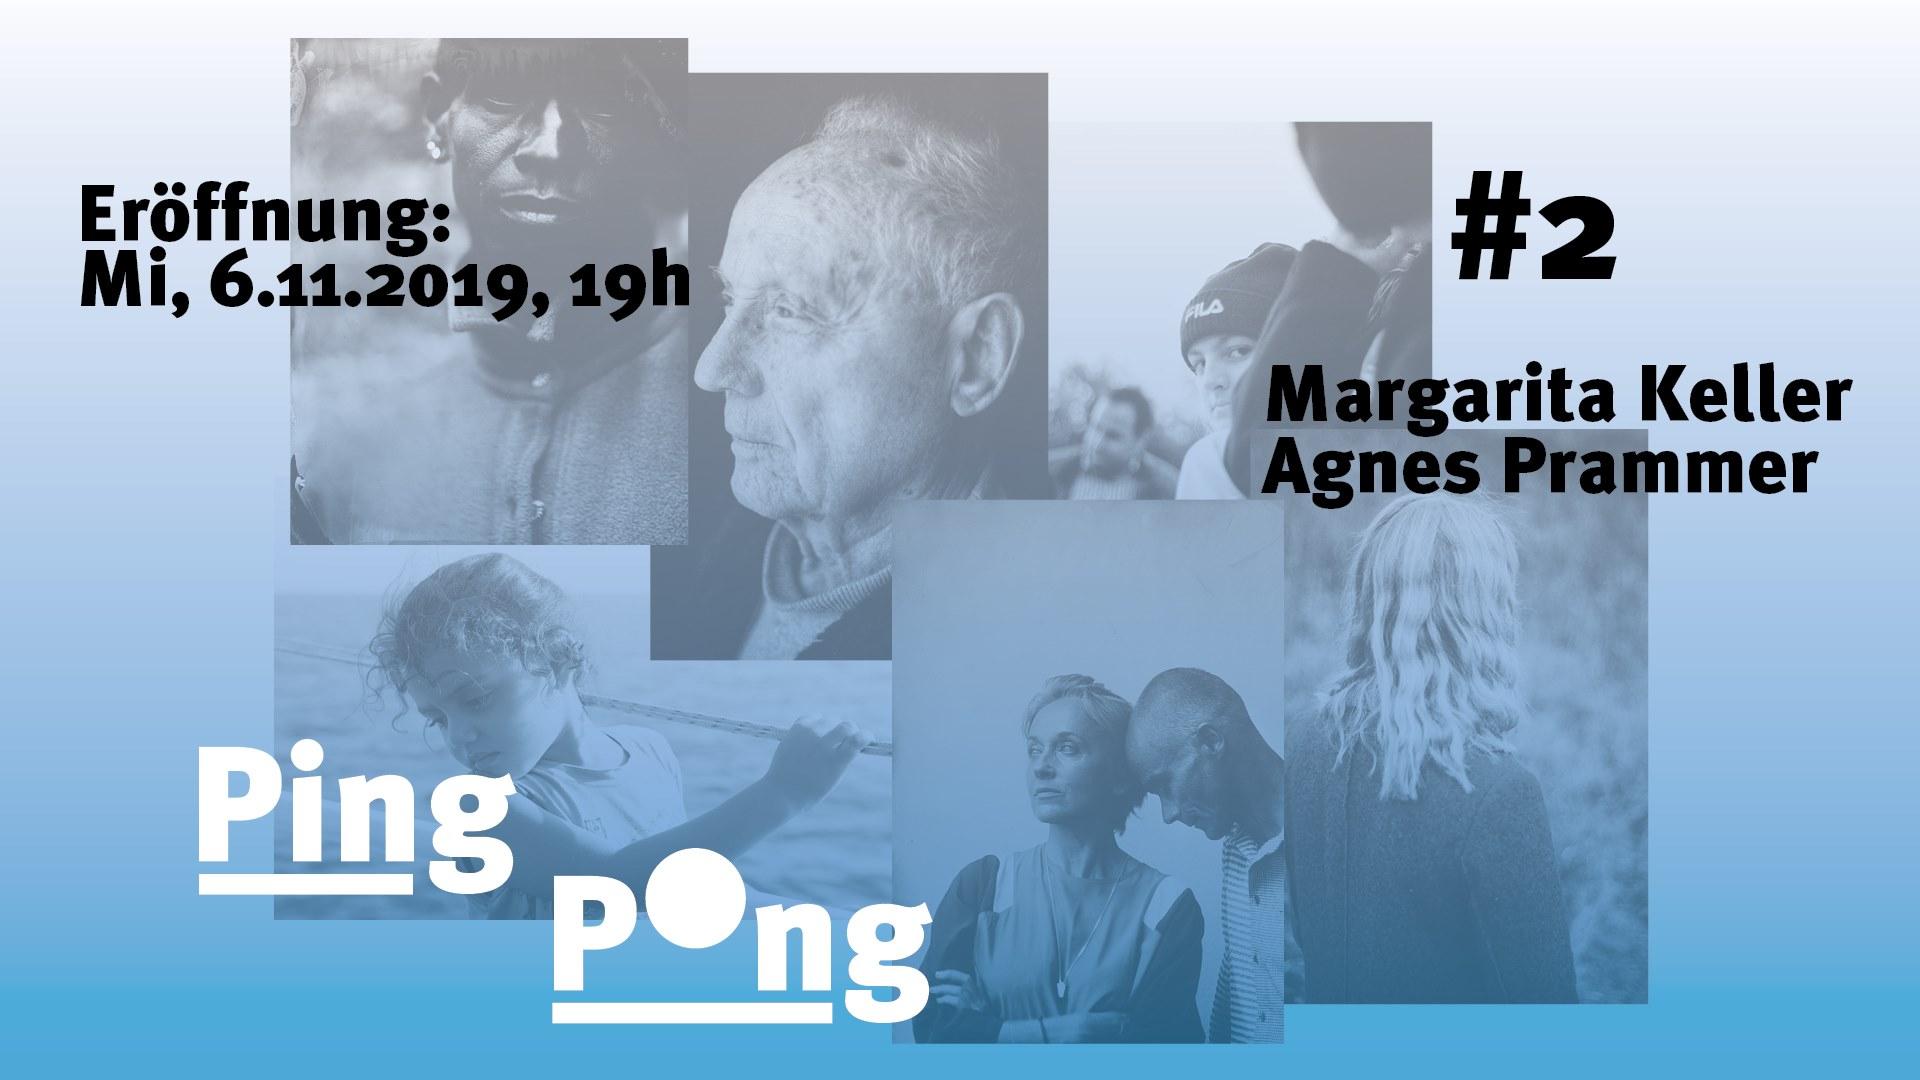 PING PONG #2: Rahmenprogramm Vermittlung